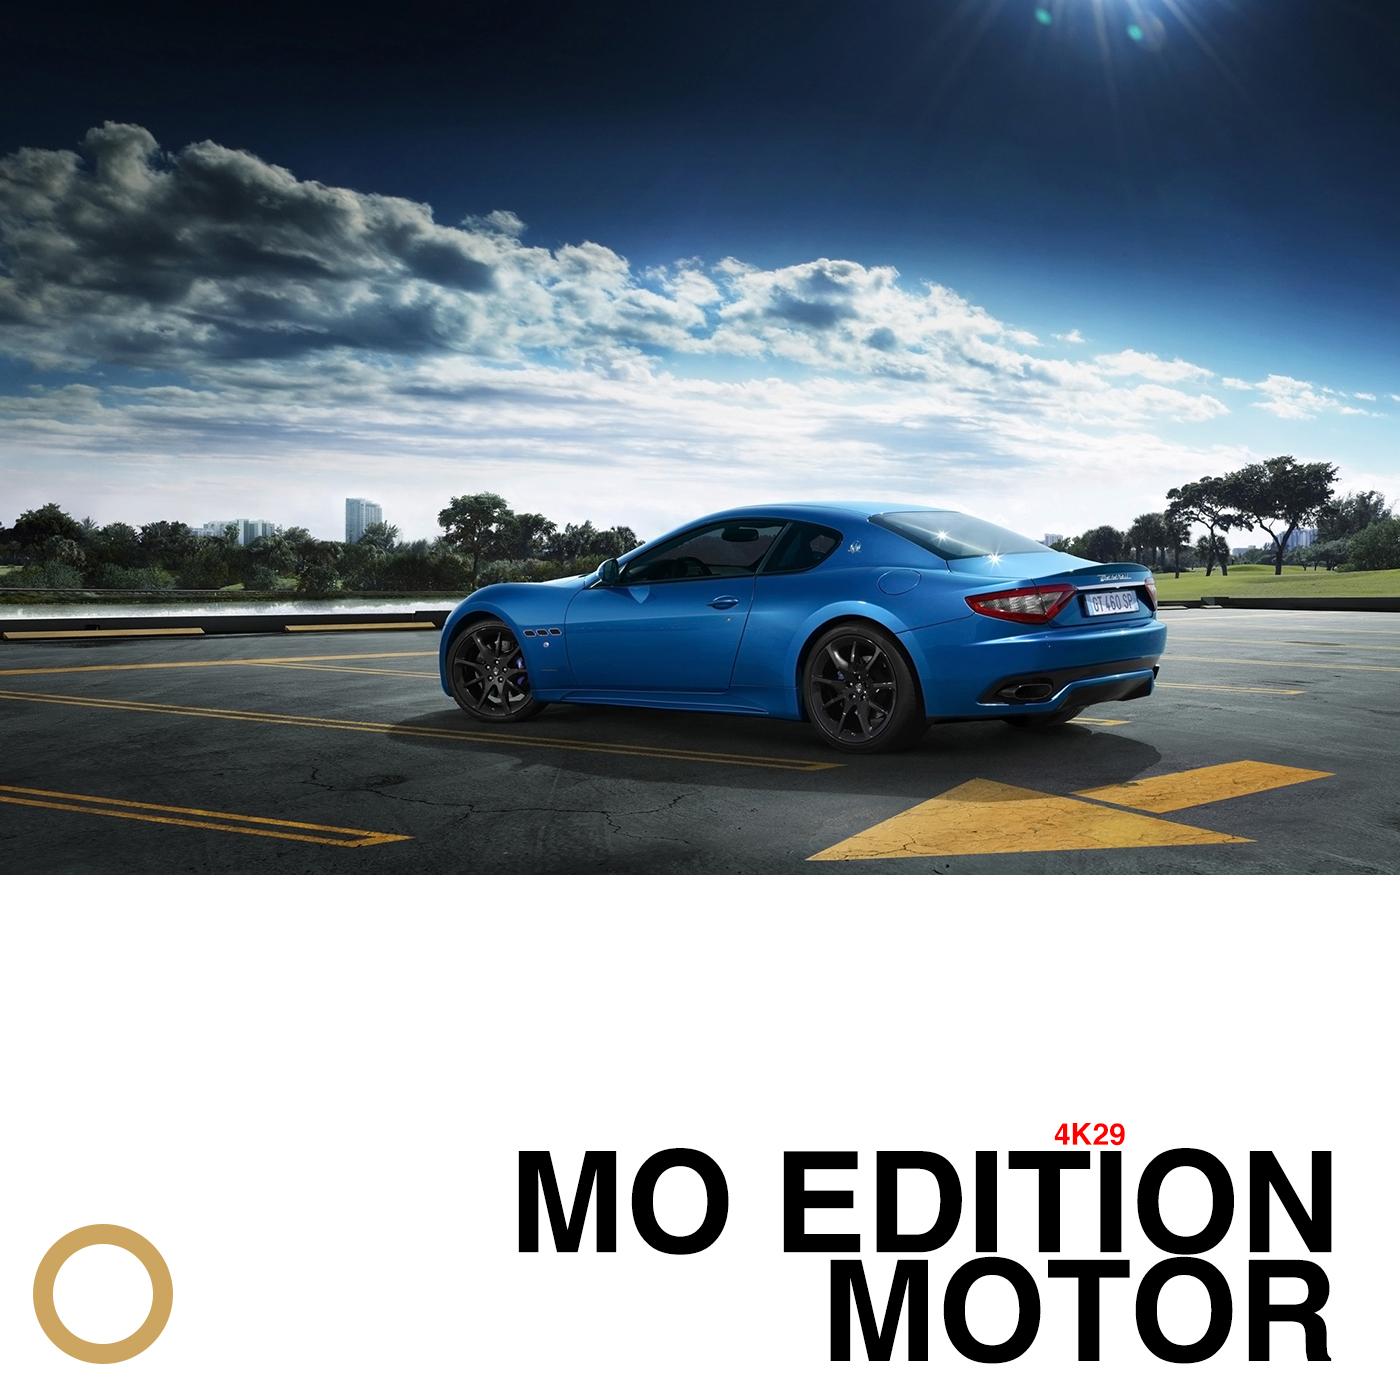 MO EDITION MOTOR 4K29